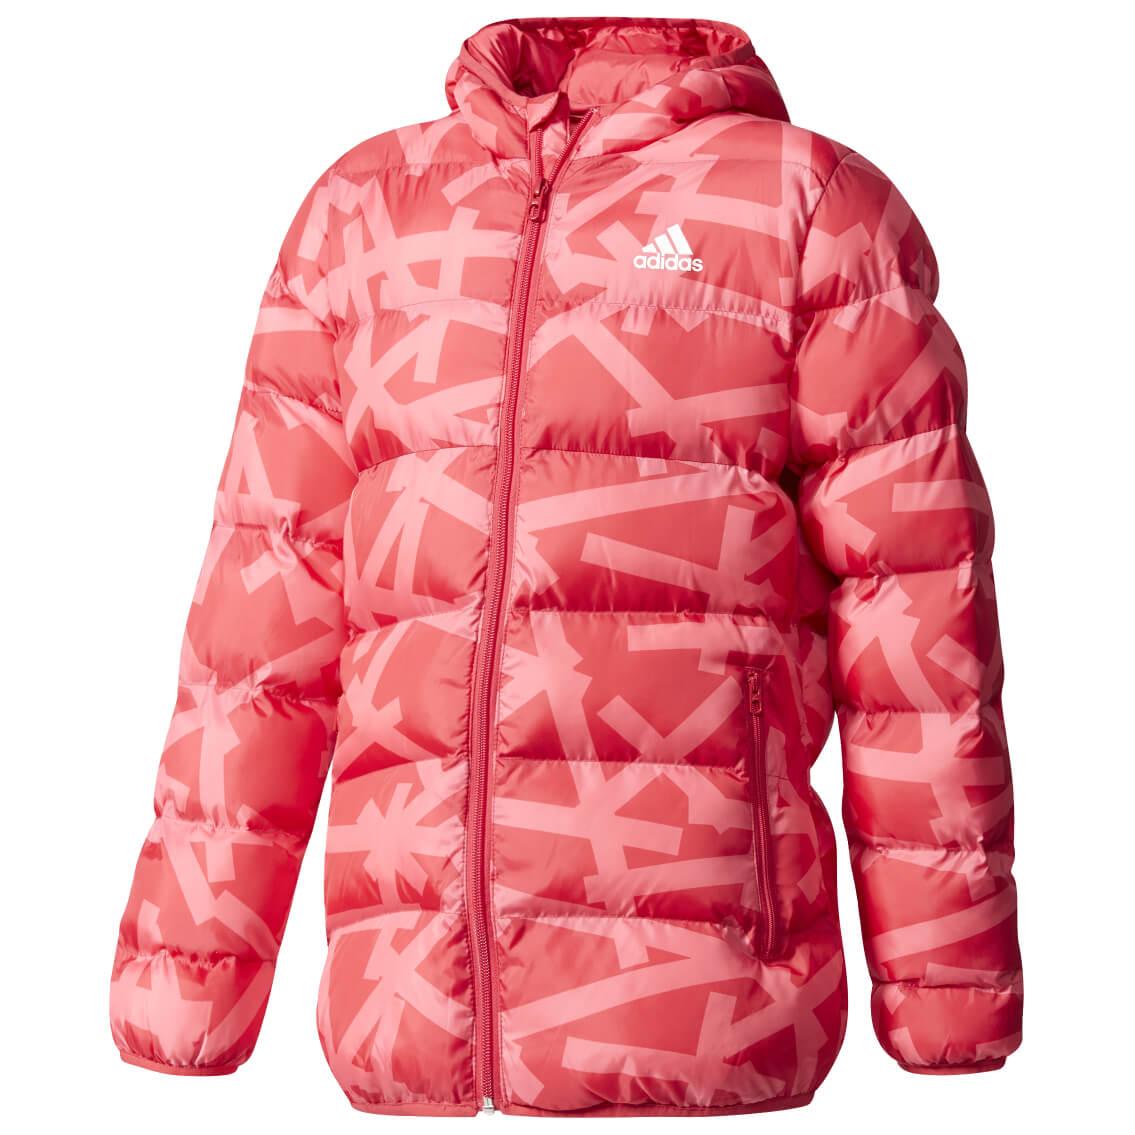 Adidas Synthetic Down BTS Jacket Winterjacke Mädchen